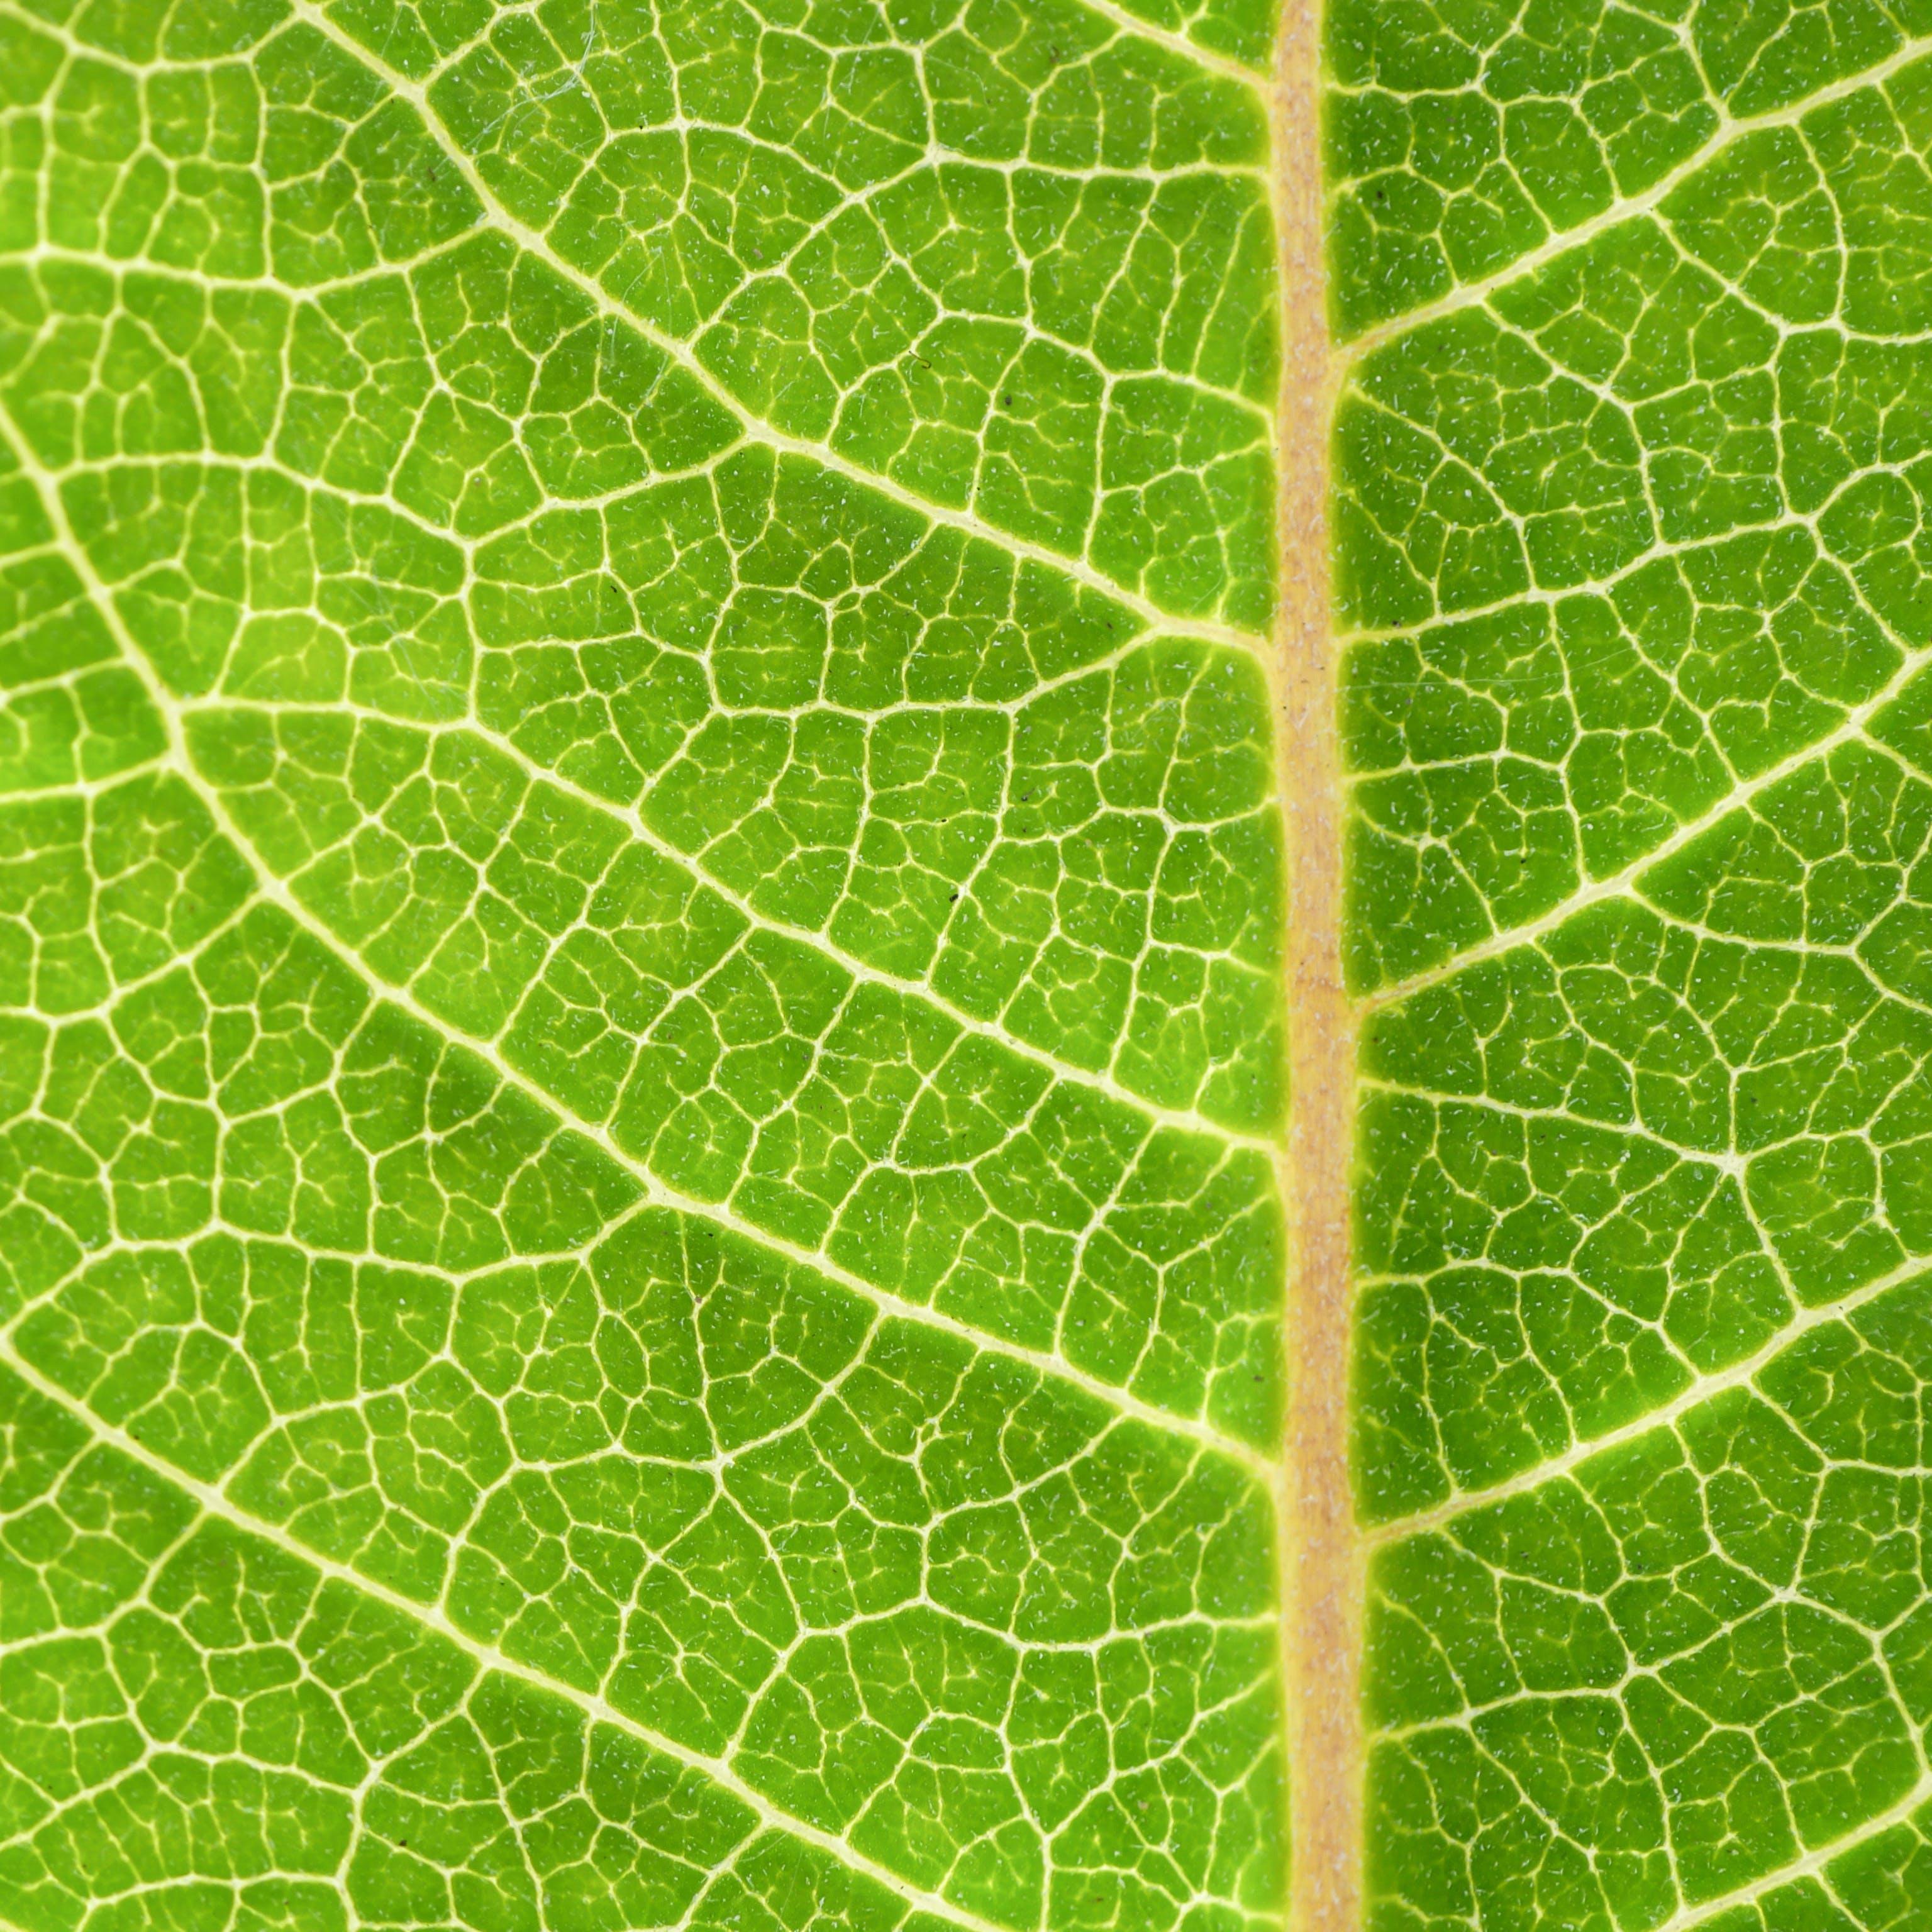 Kostenloses Stock Foto zu frisch, grün, grünes blatt, nahansicht